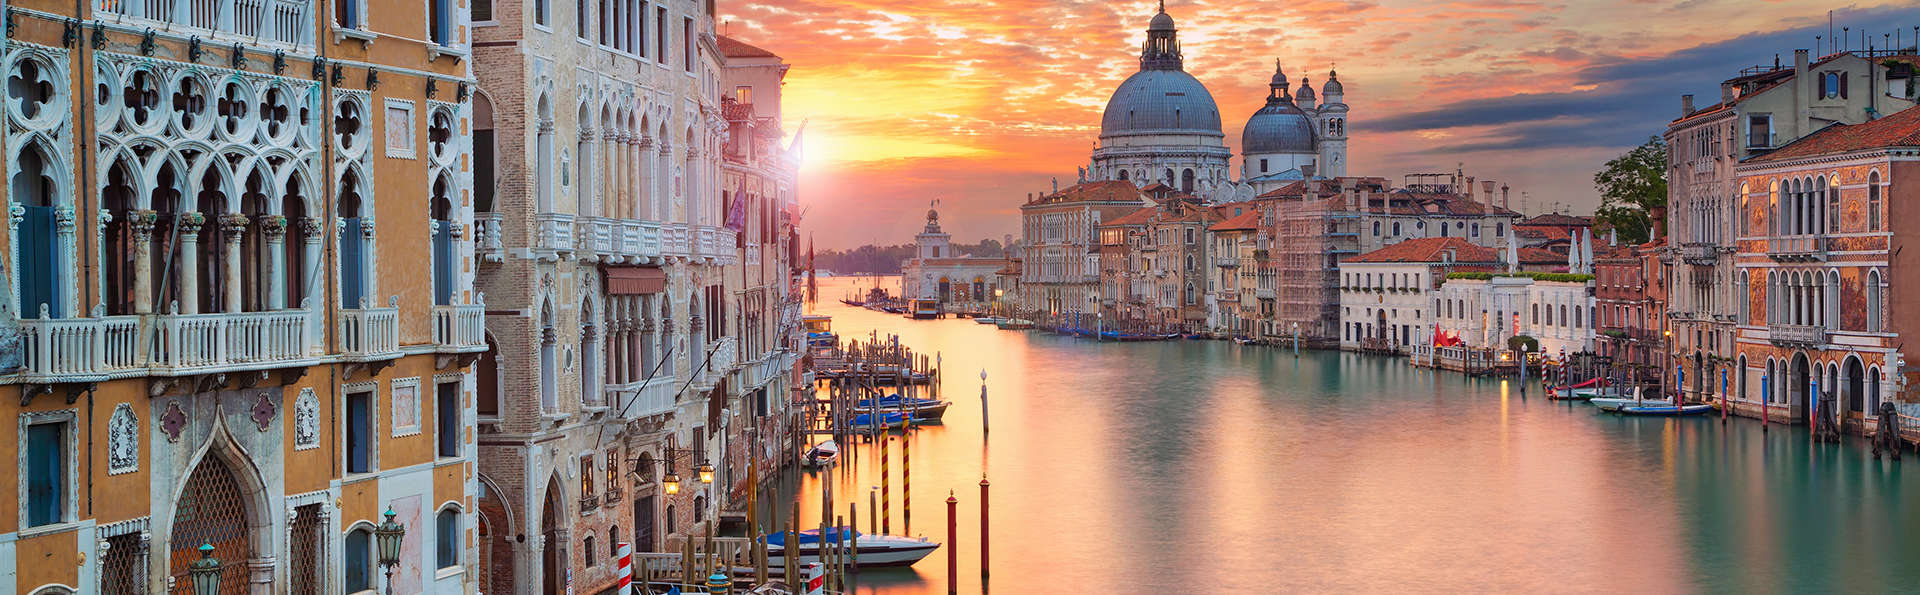 Appartamenti San Simeon - Edit_Venice3.jpg